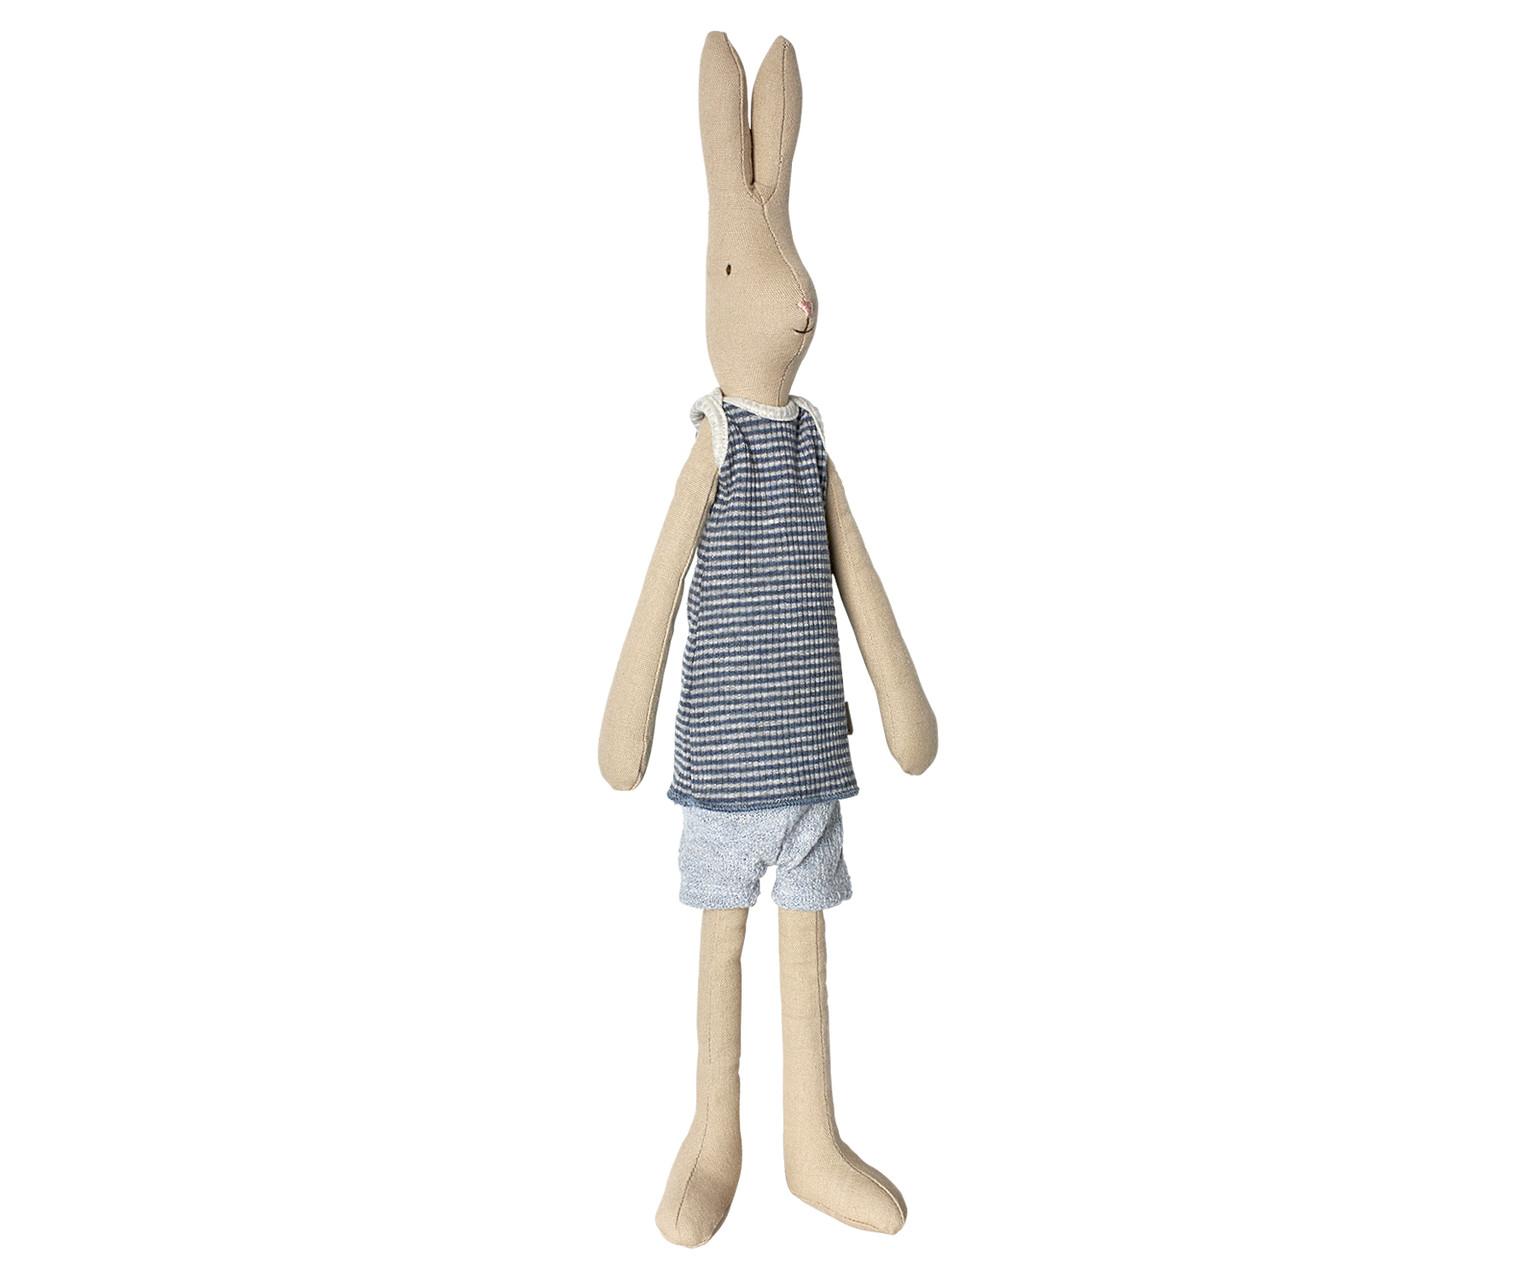 Hase Medium - Junge - Rabitt Bunny boy- Maileg